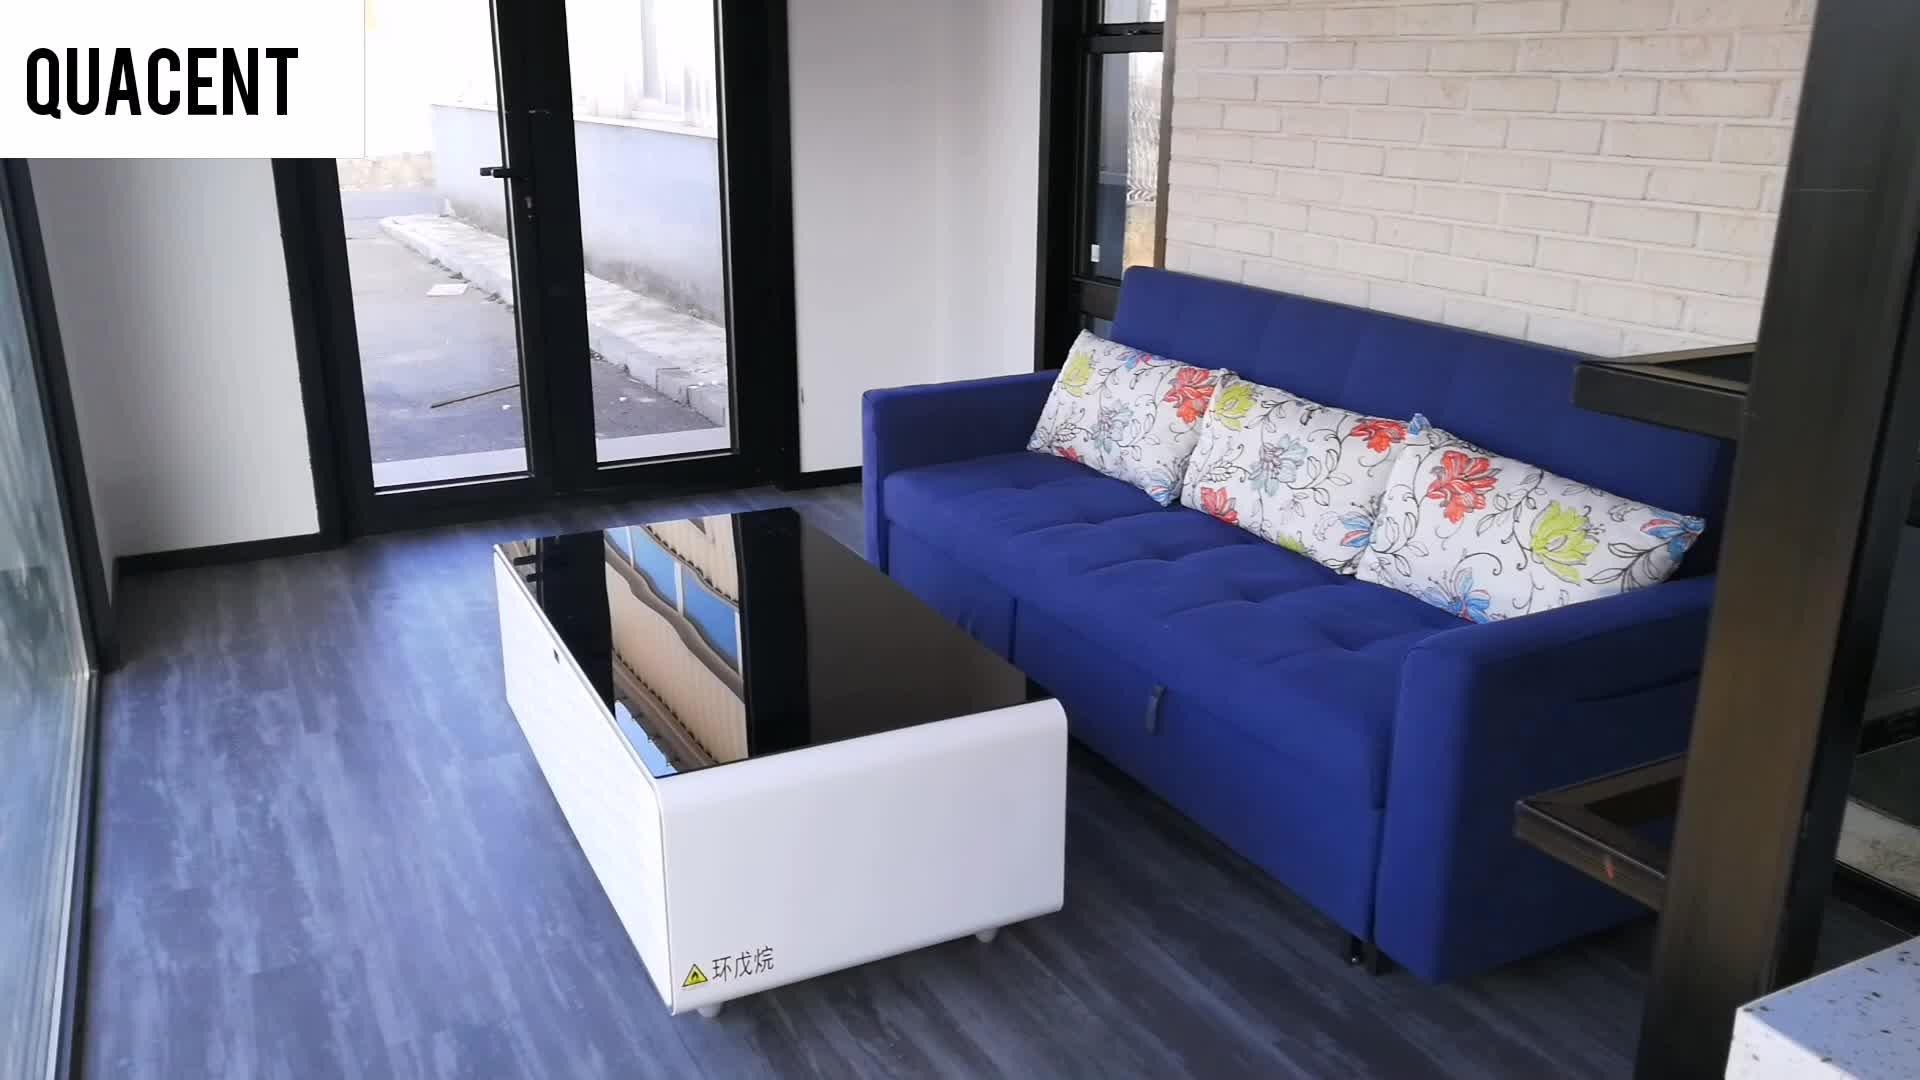 Quacent 럭셔리 모바일 작은 홈 작은 집 빌라 조립식 홈 맞춤형 구조 조립식 부동산 코티지 헛 아파트